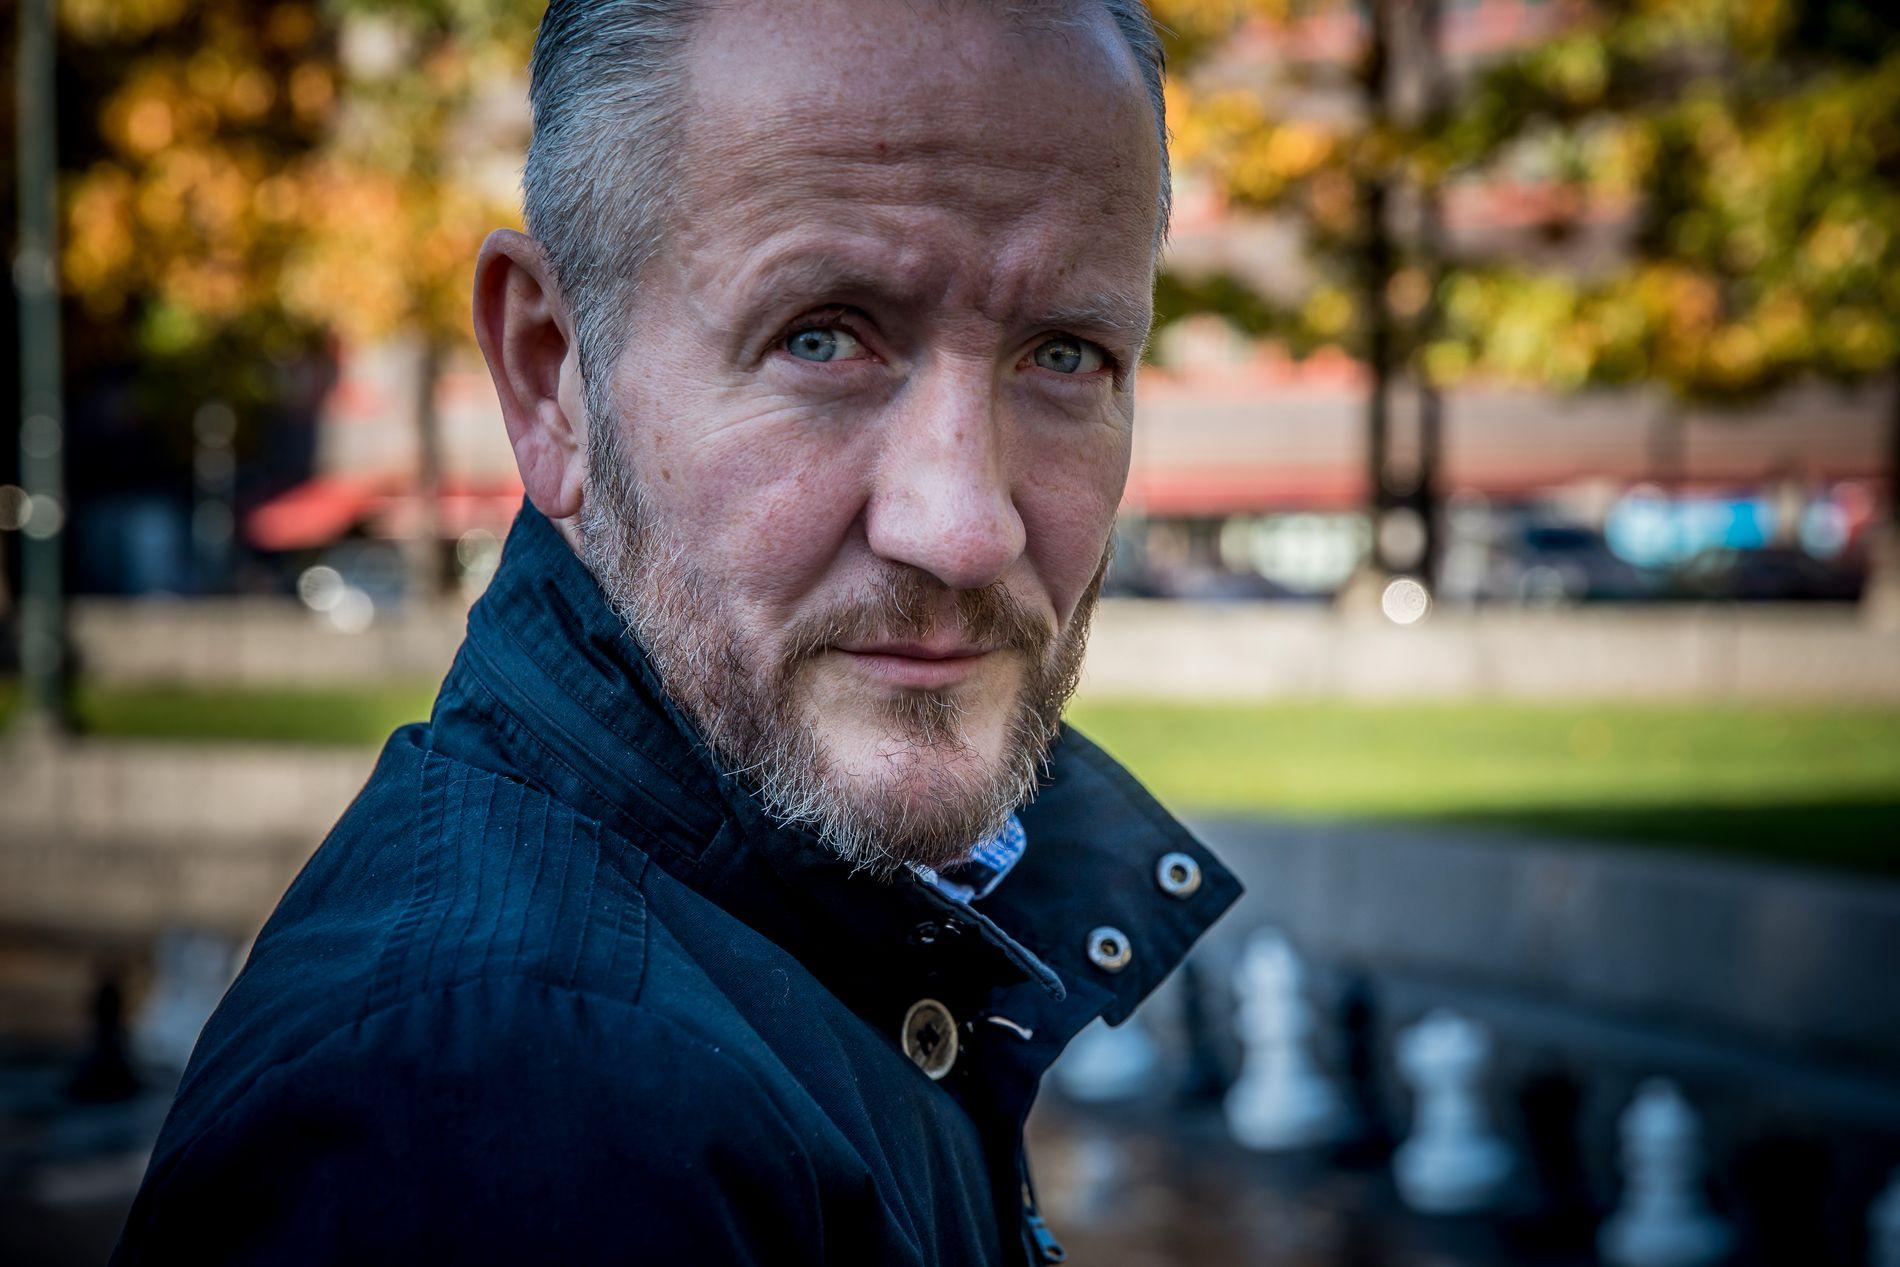 OMSTRIDT: Geir Magne Haukås i et intervju med VG for noen uker siden.